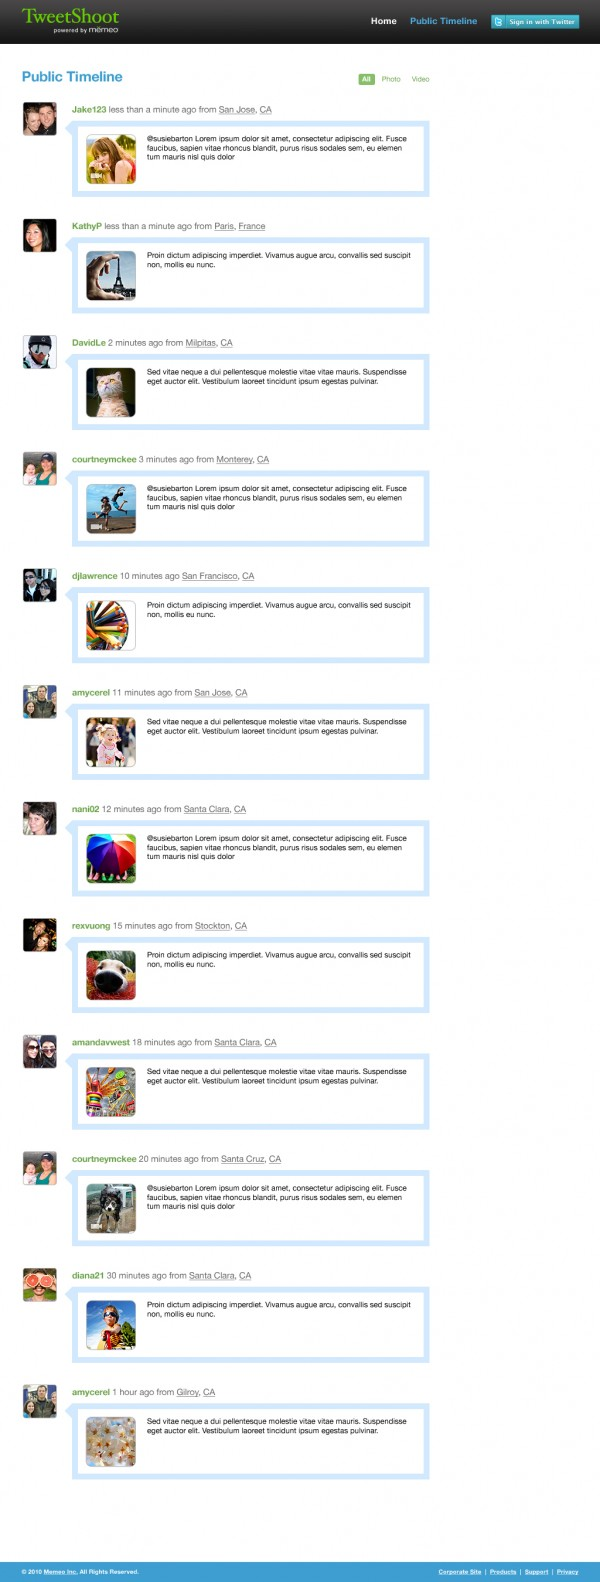 02-tweetshoot-publictimeline(nonloggedin)v3